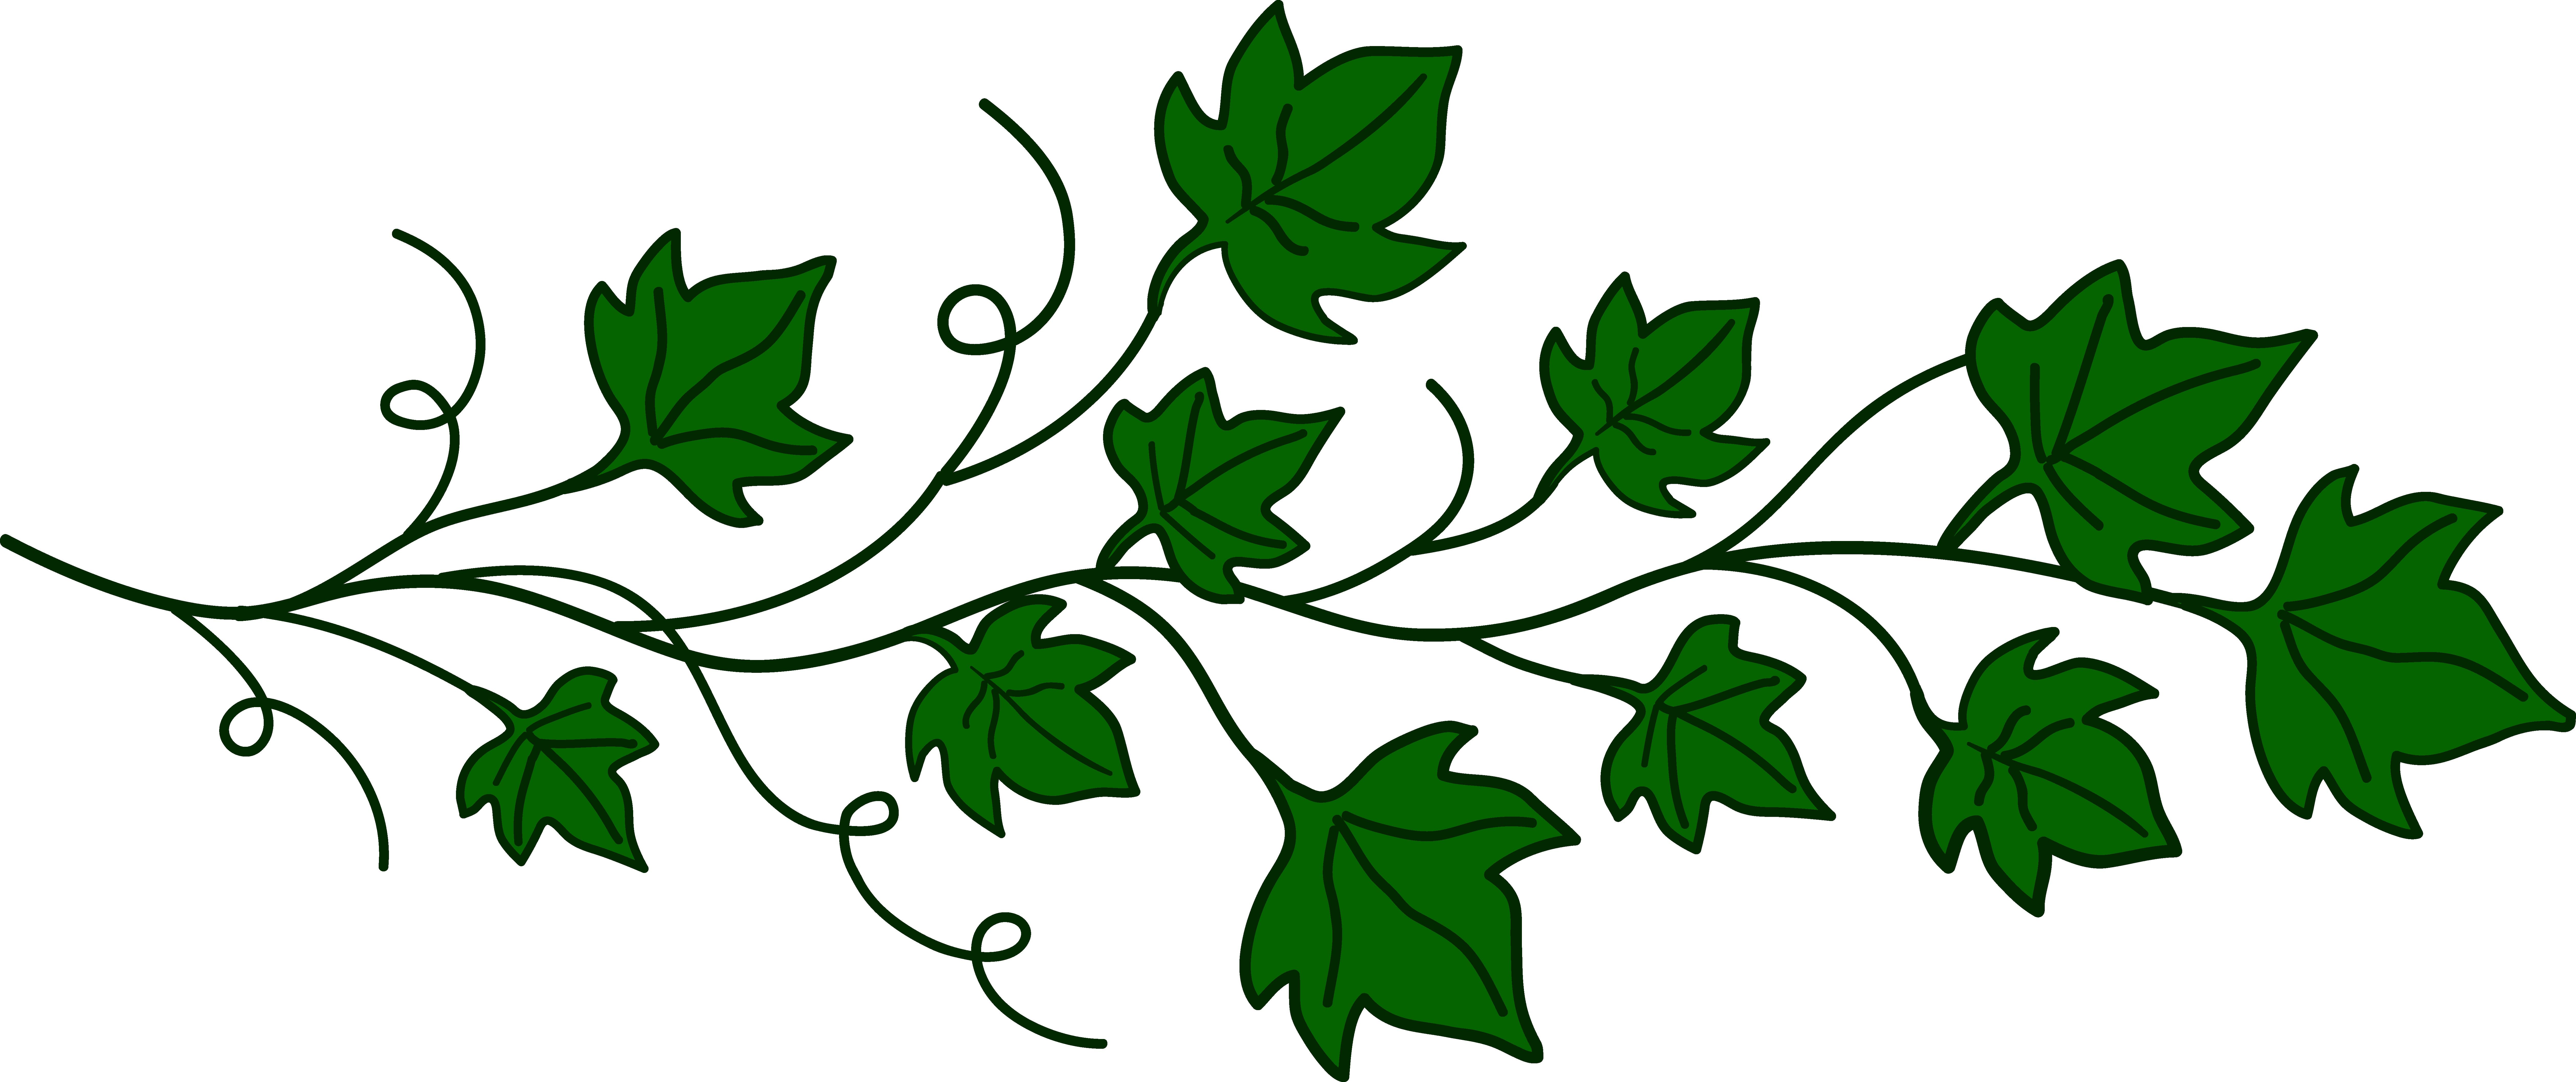 Vine Of Ivy Leaves Free Clip Art-Vine of ivy leaves free clip art-16